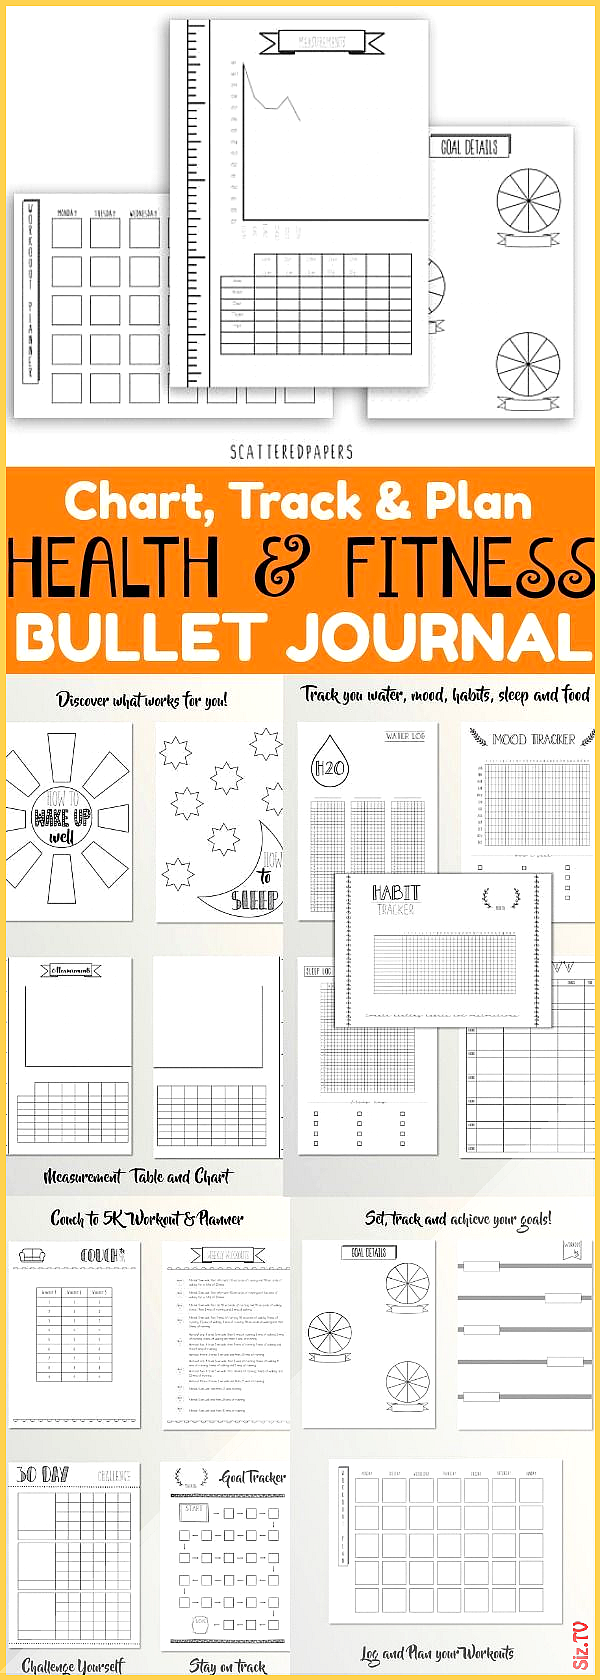 Health and Fitness Bullet Journal  Eine Vielzahl von Seiten die sich dem Health and Fitness Bullet J...